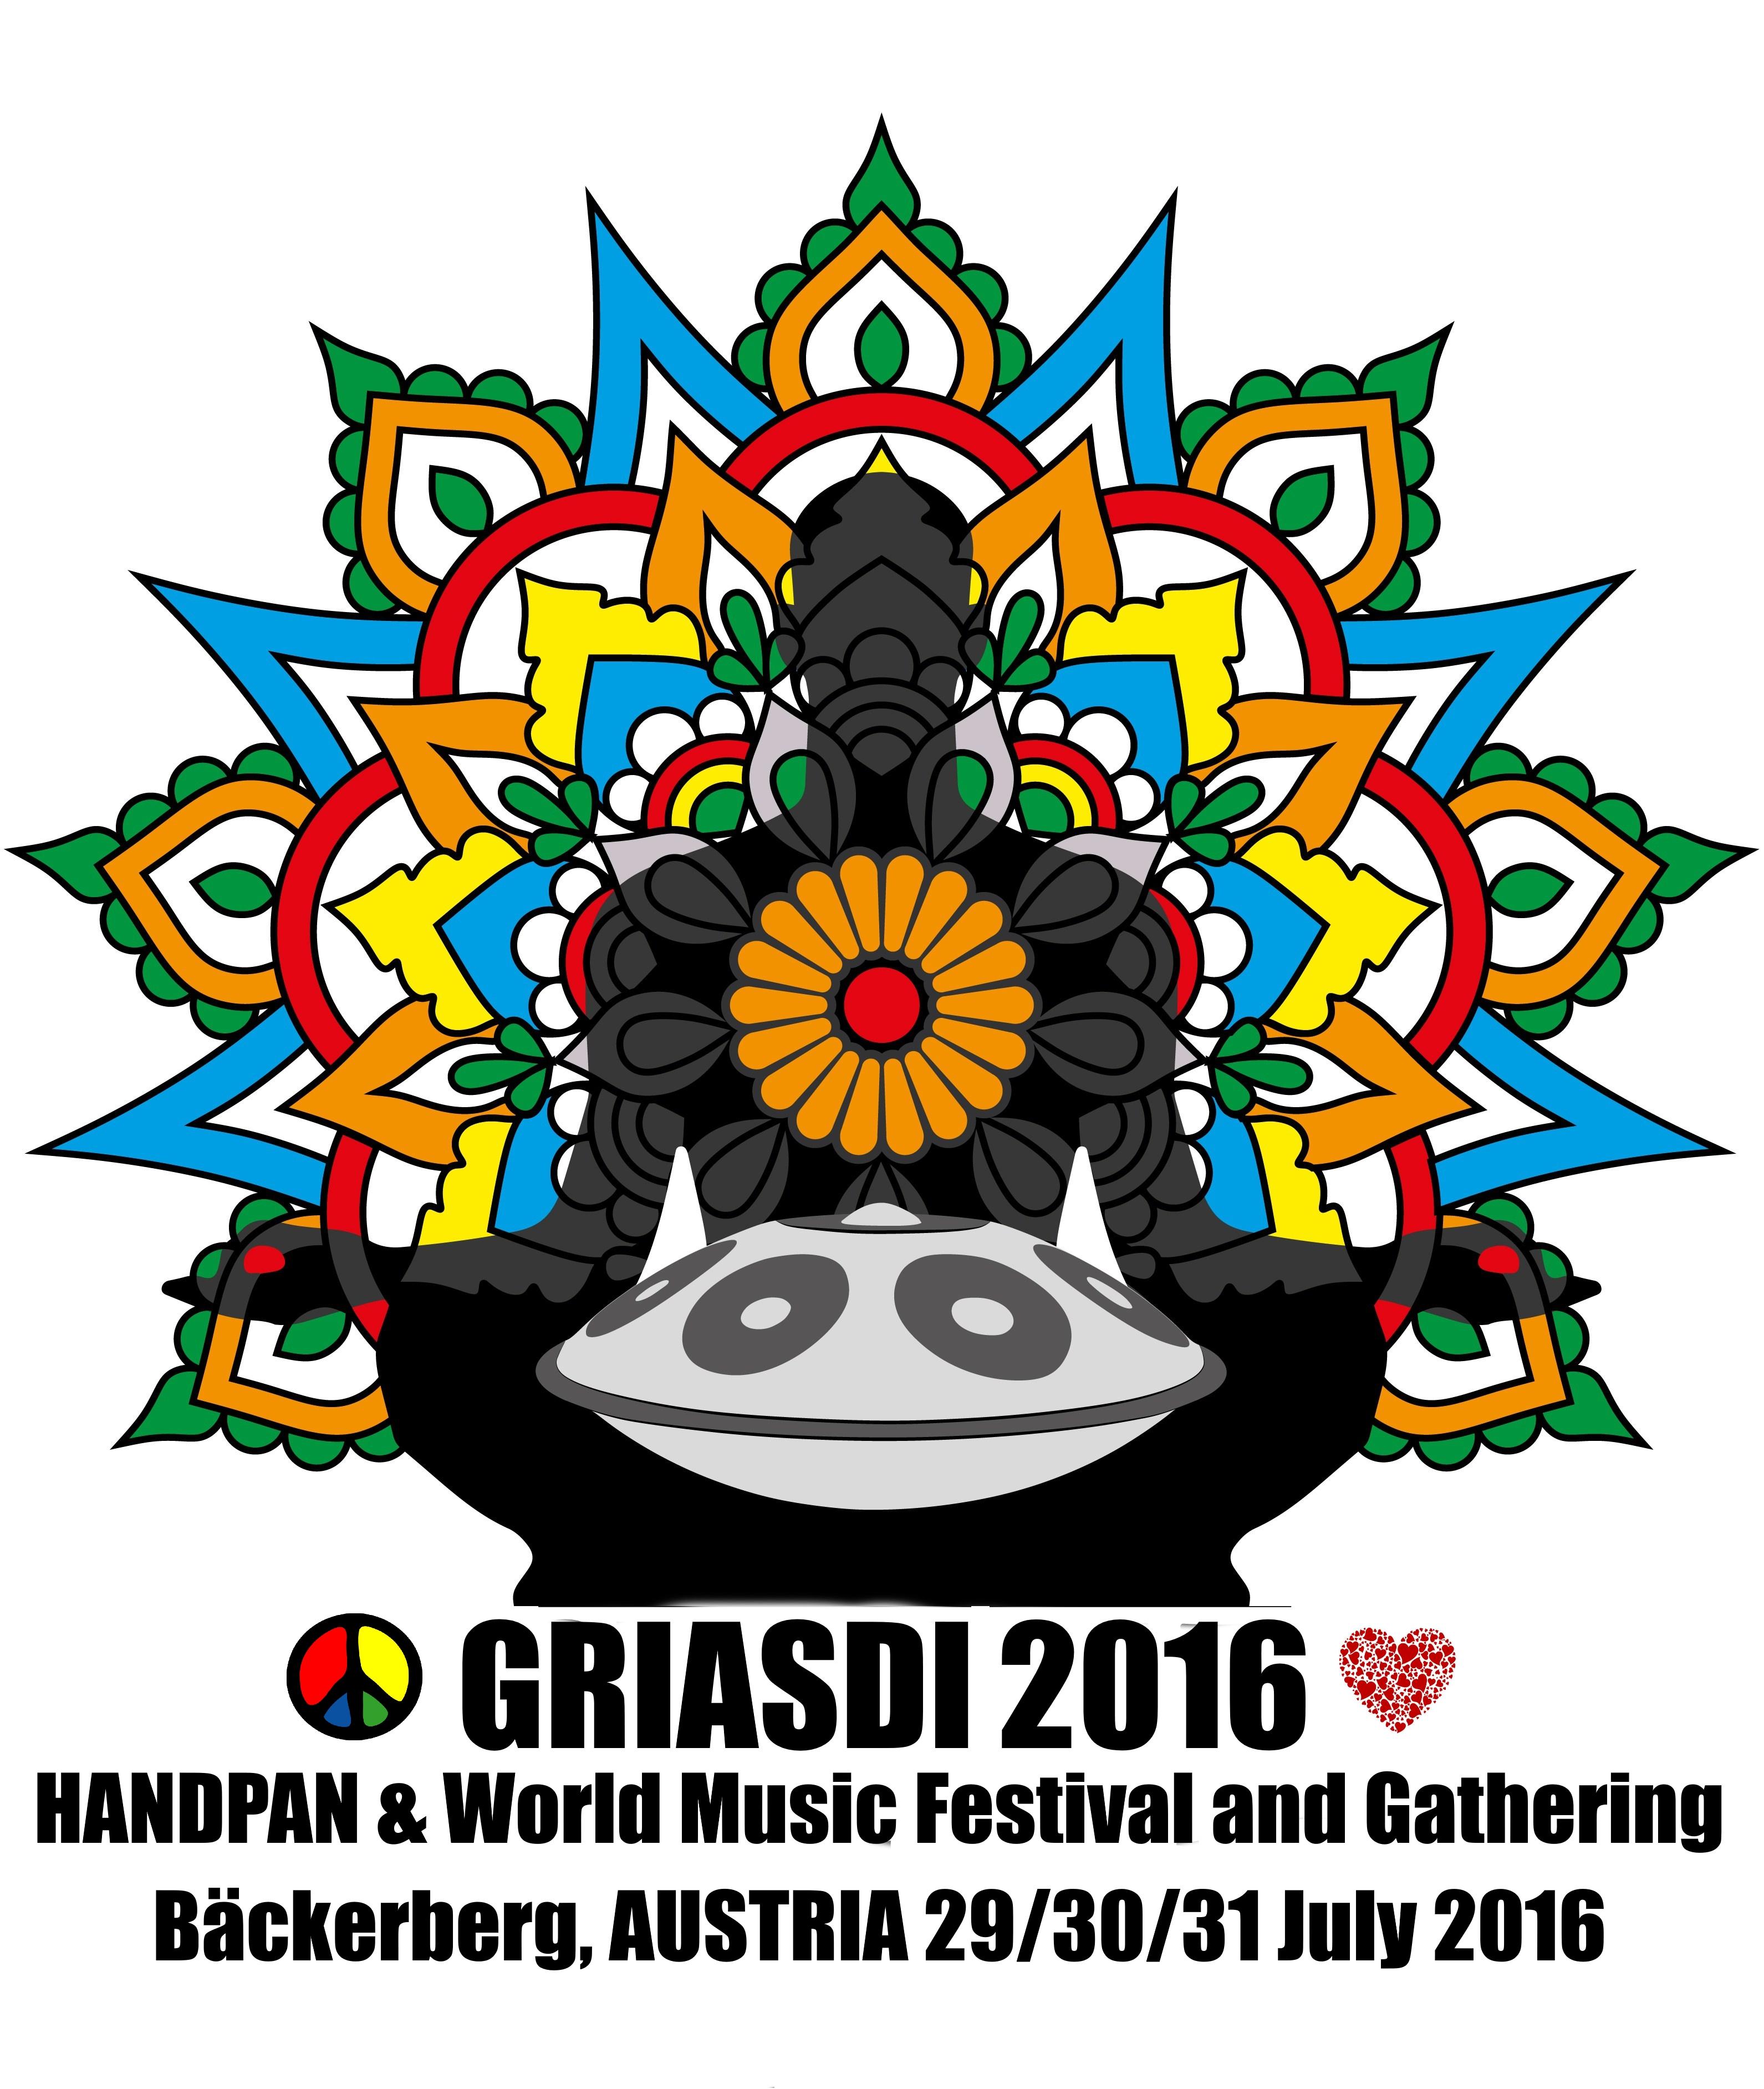 GRIASDI2016_advoLogo